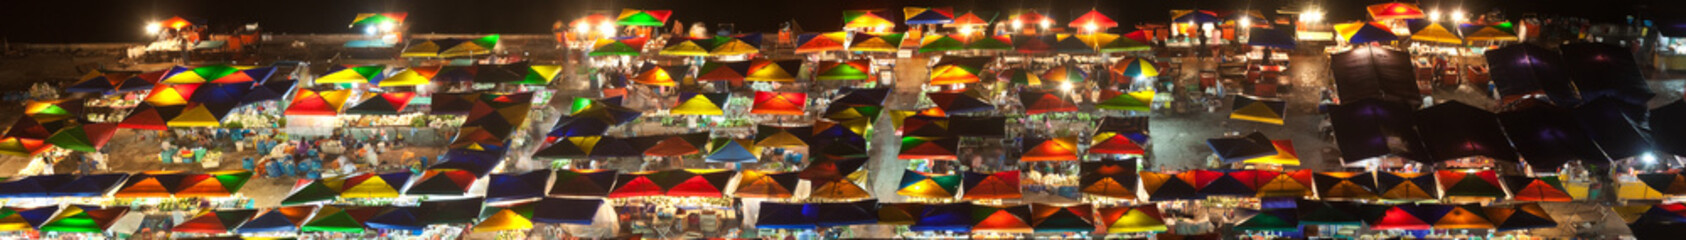 Night market at Kota Kinabalu, Malaysia